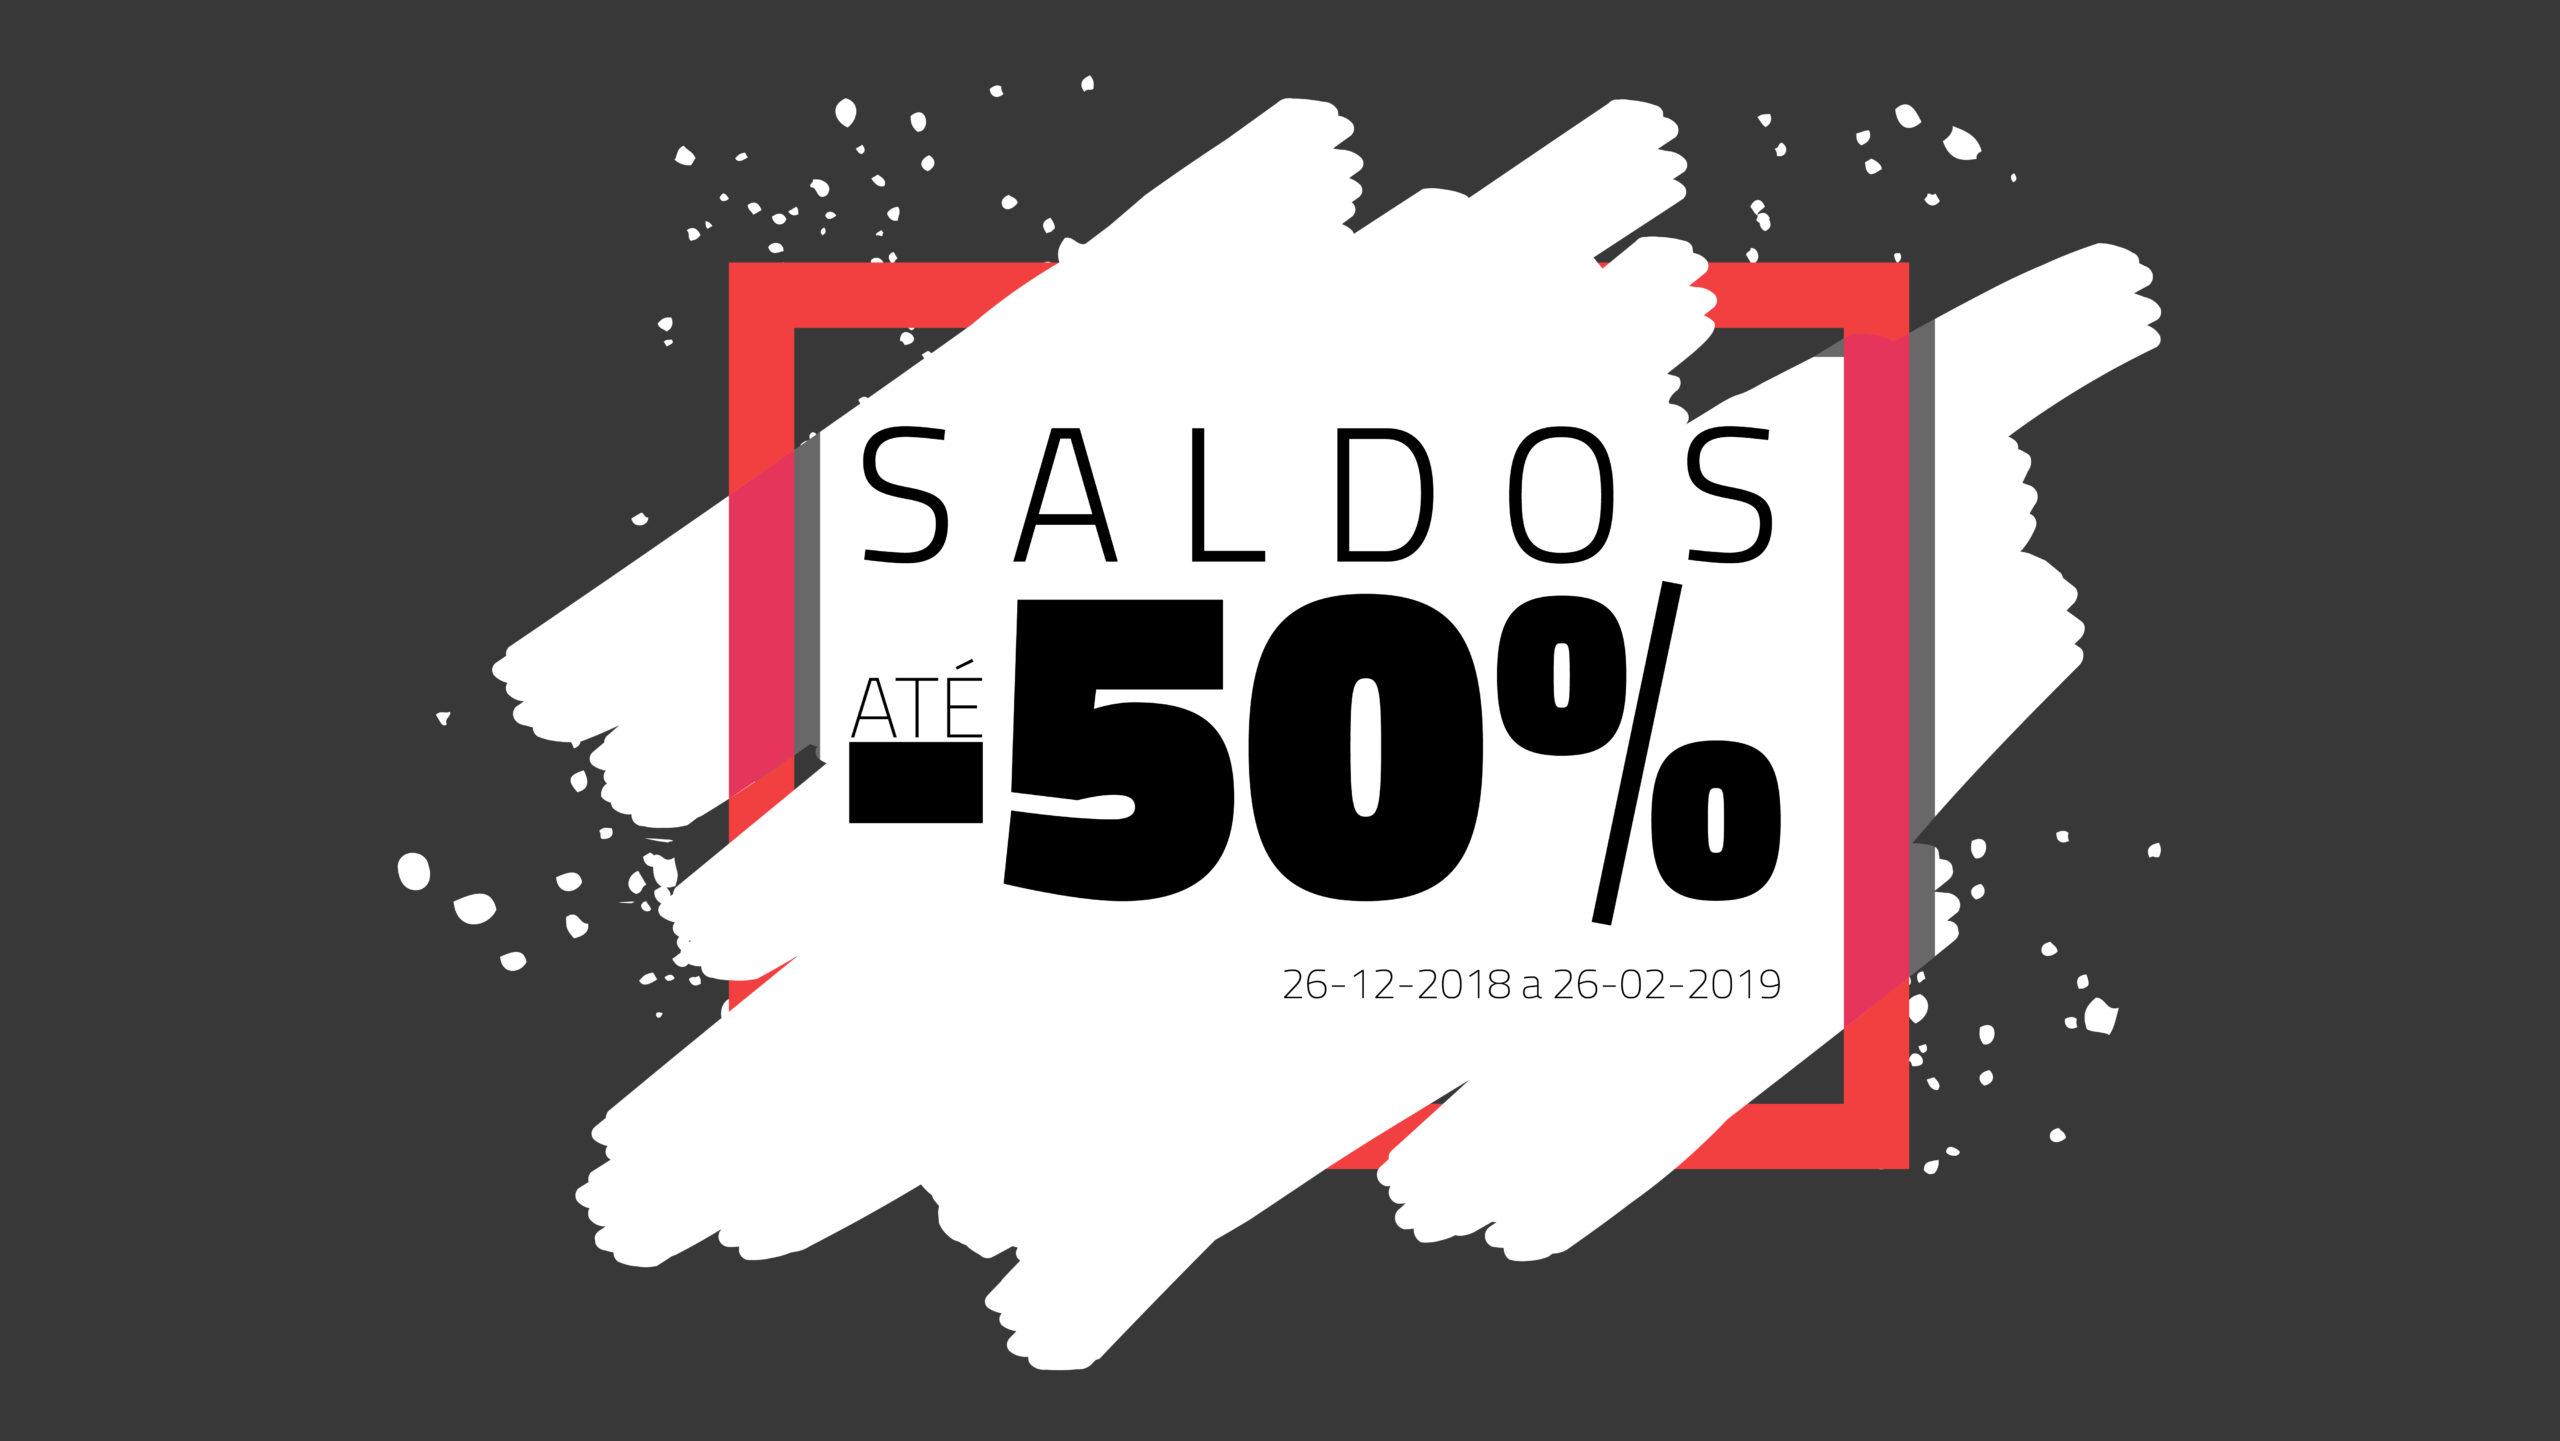 saldos_slider-scaled